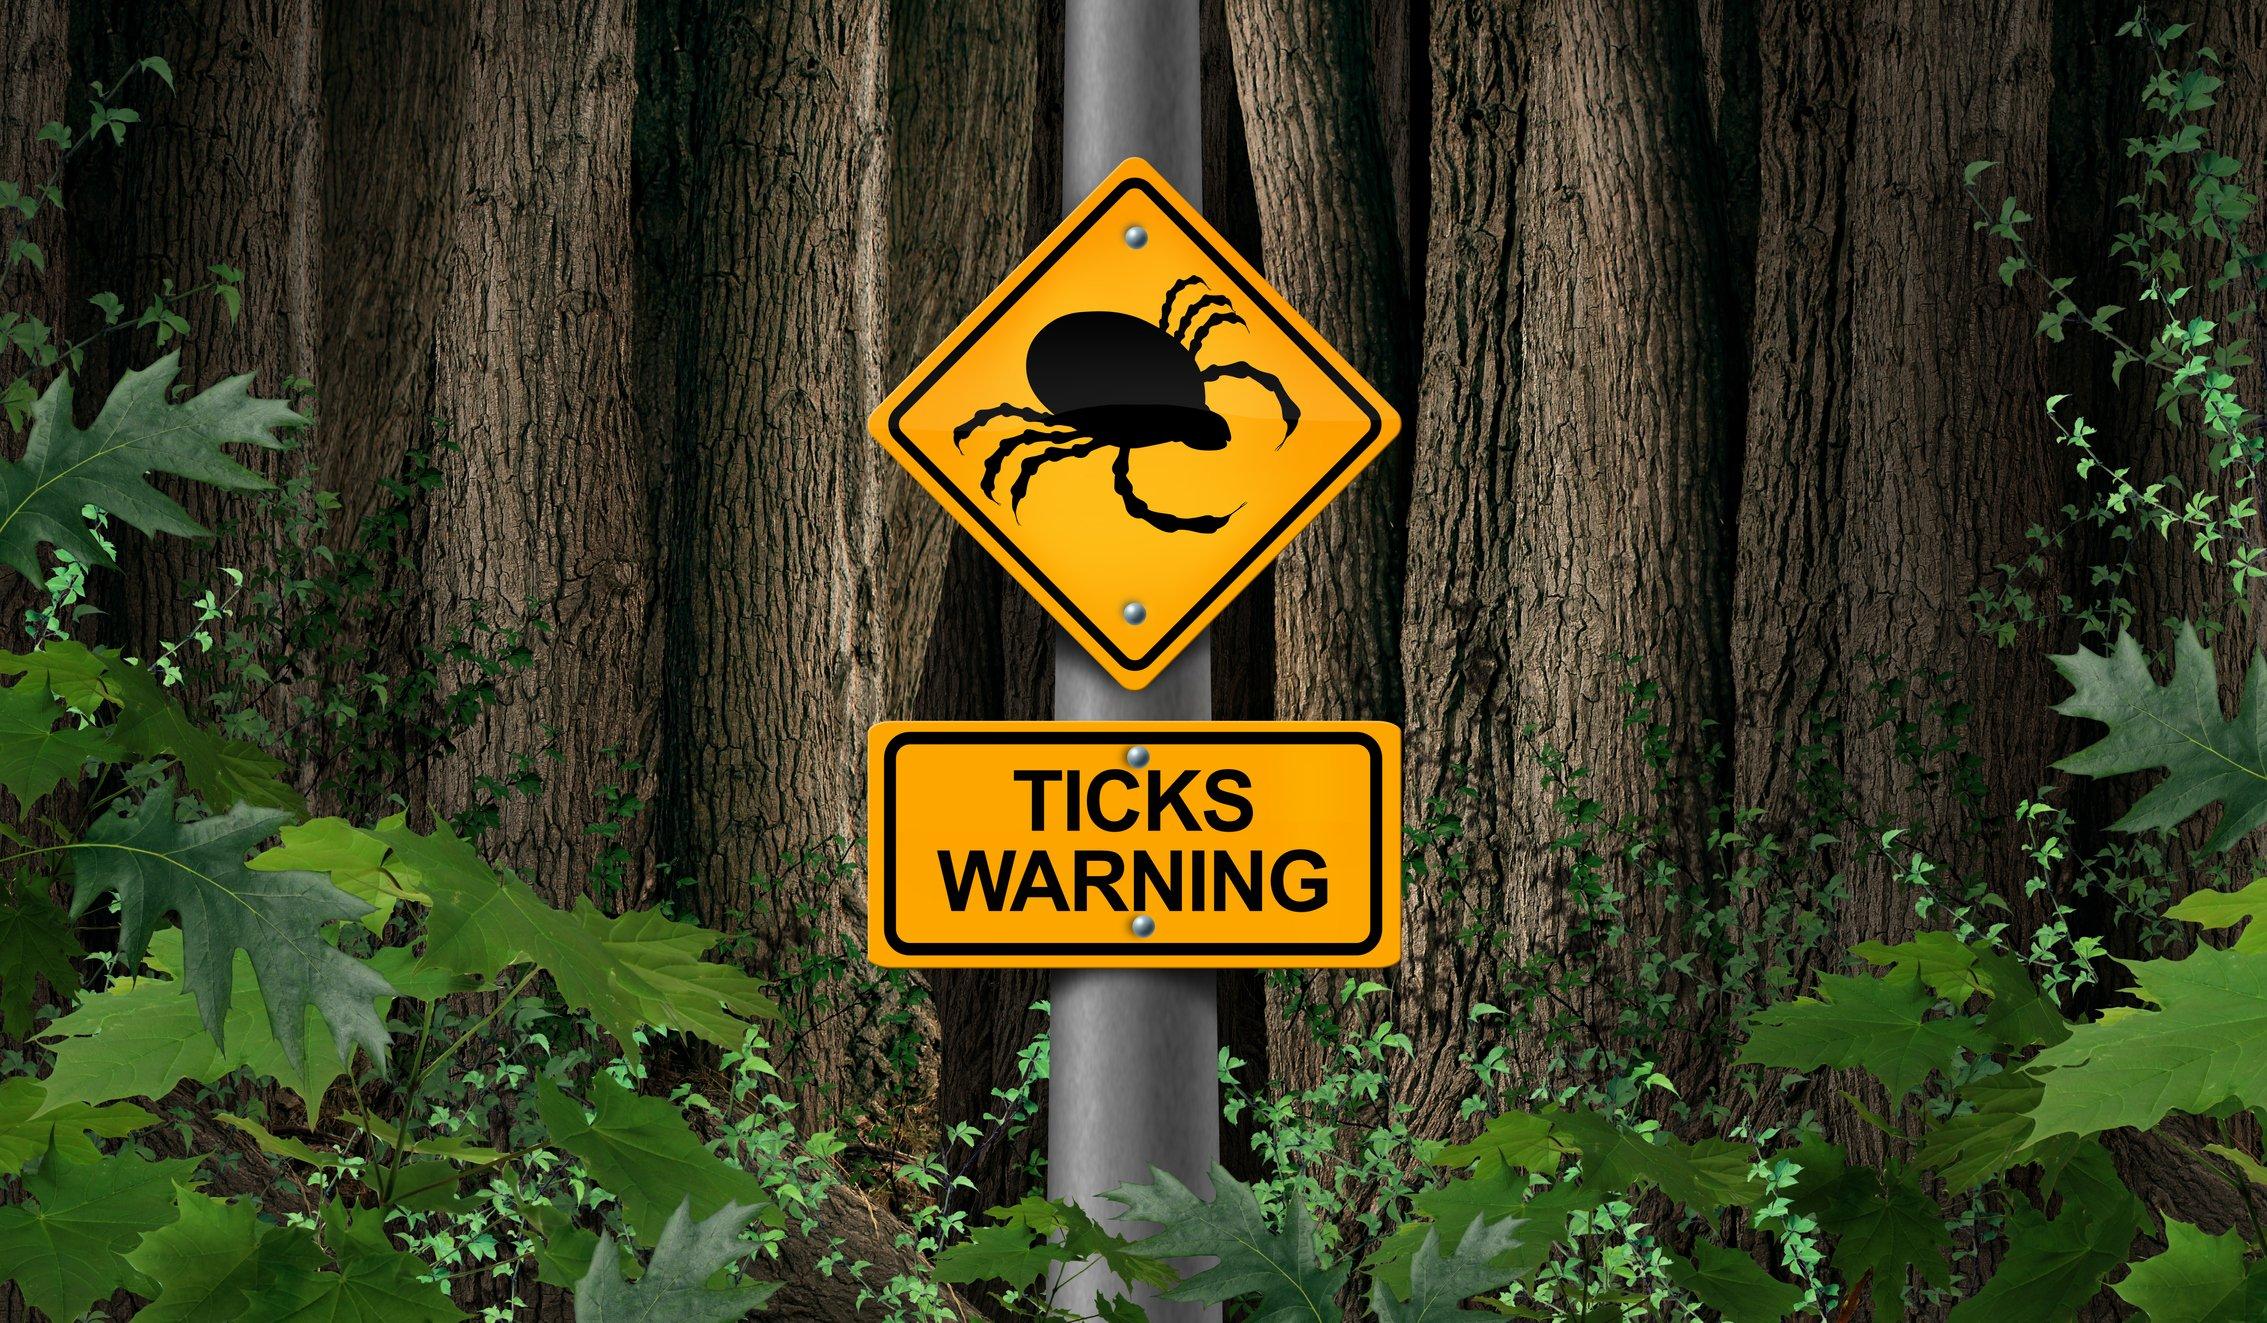 Beware of blacklegged ticks.